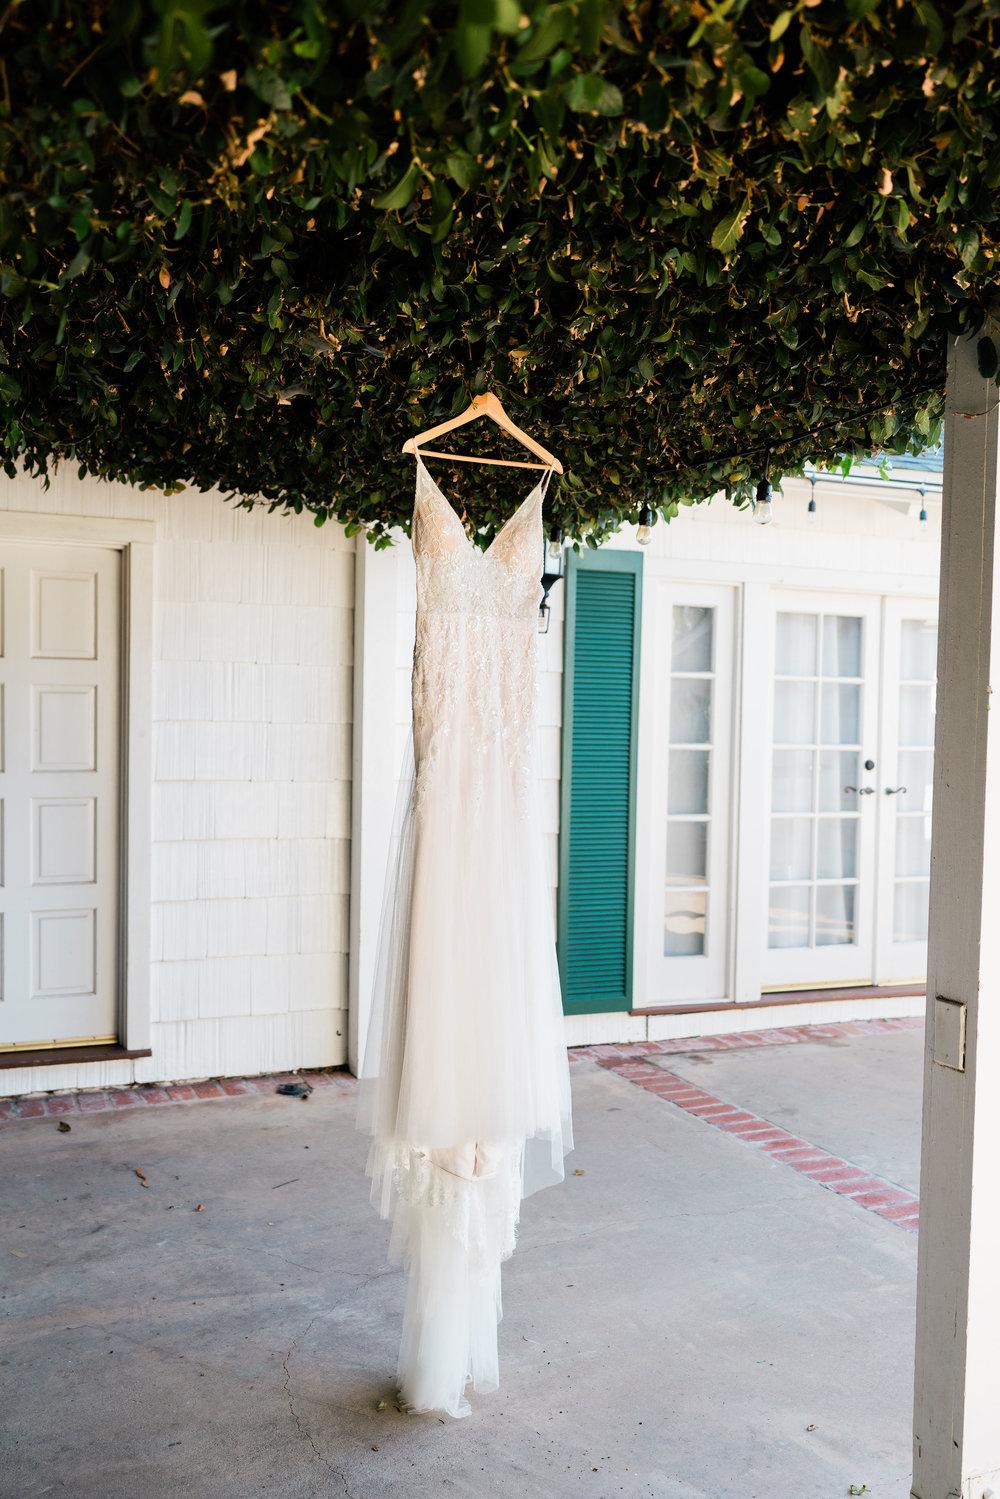 allie-shupe-tyler-wiggins-wedding-santa-barbara 004.jpg